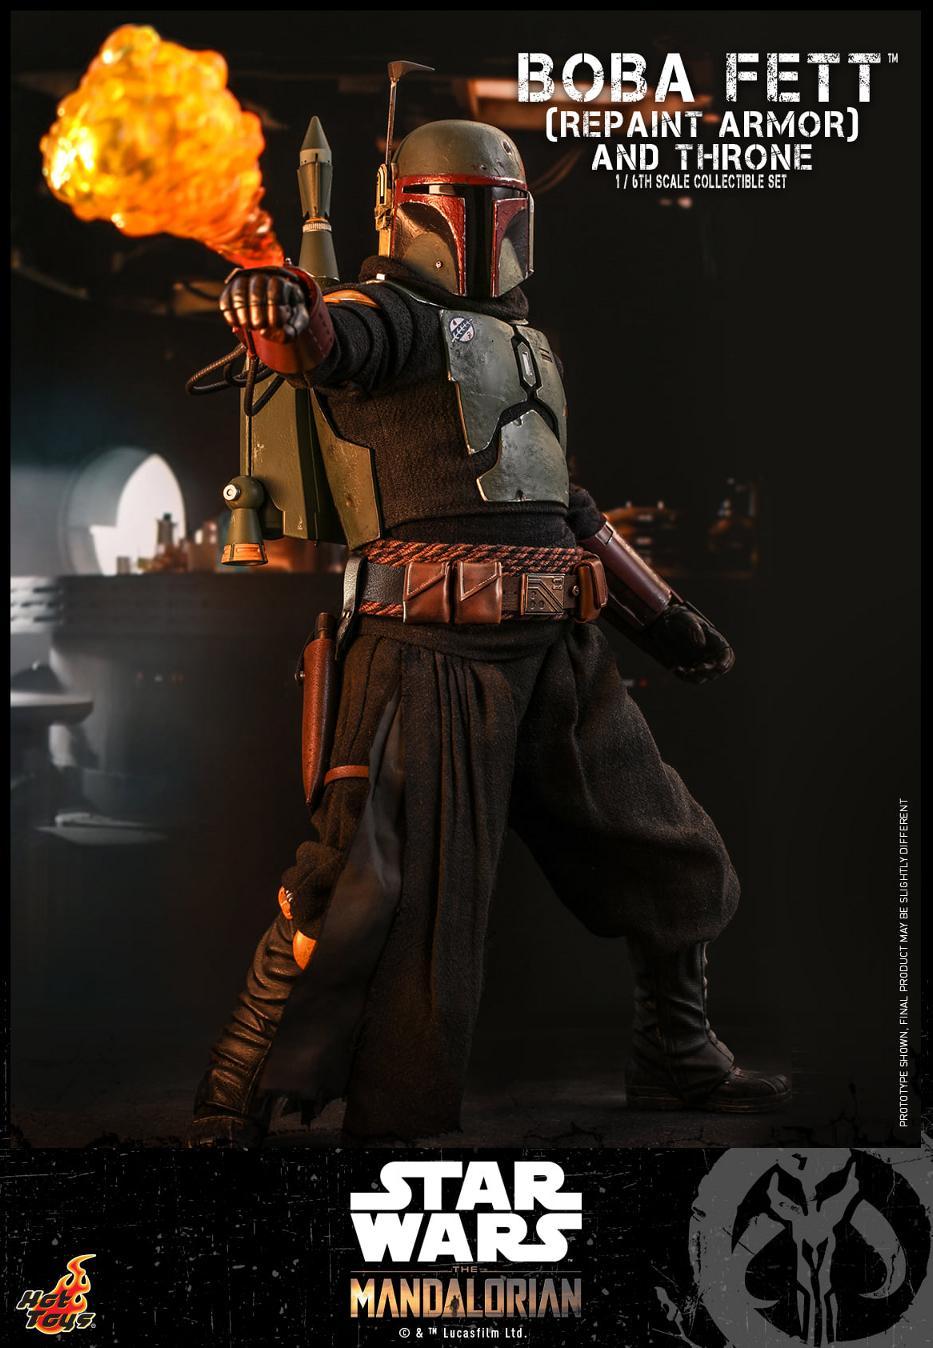 Boba Fett (Repaint Armor) & Throne Collectible Set Hot Toys Boba_f48